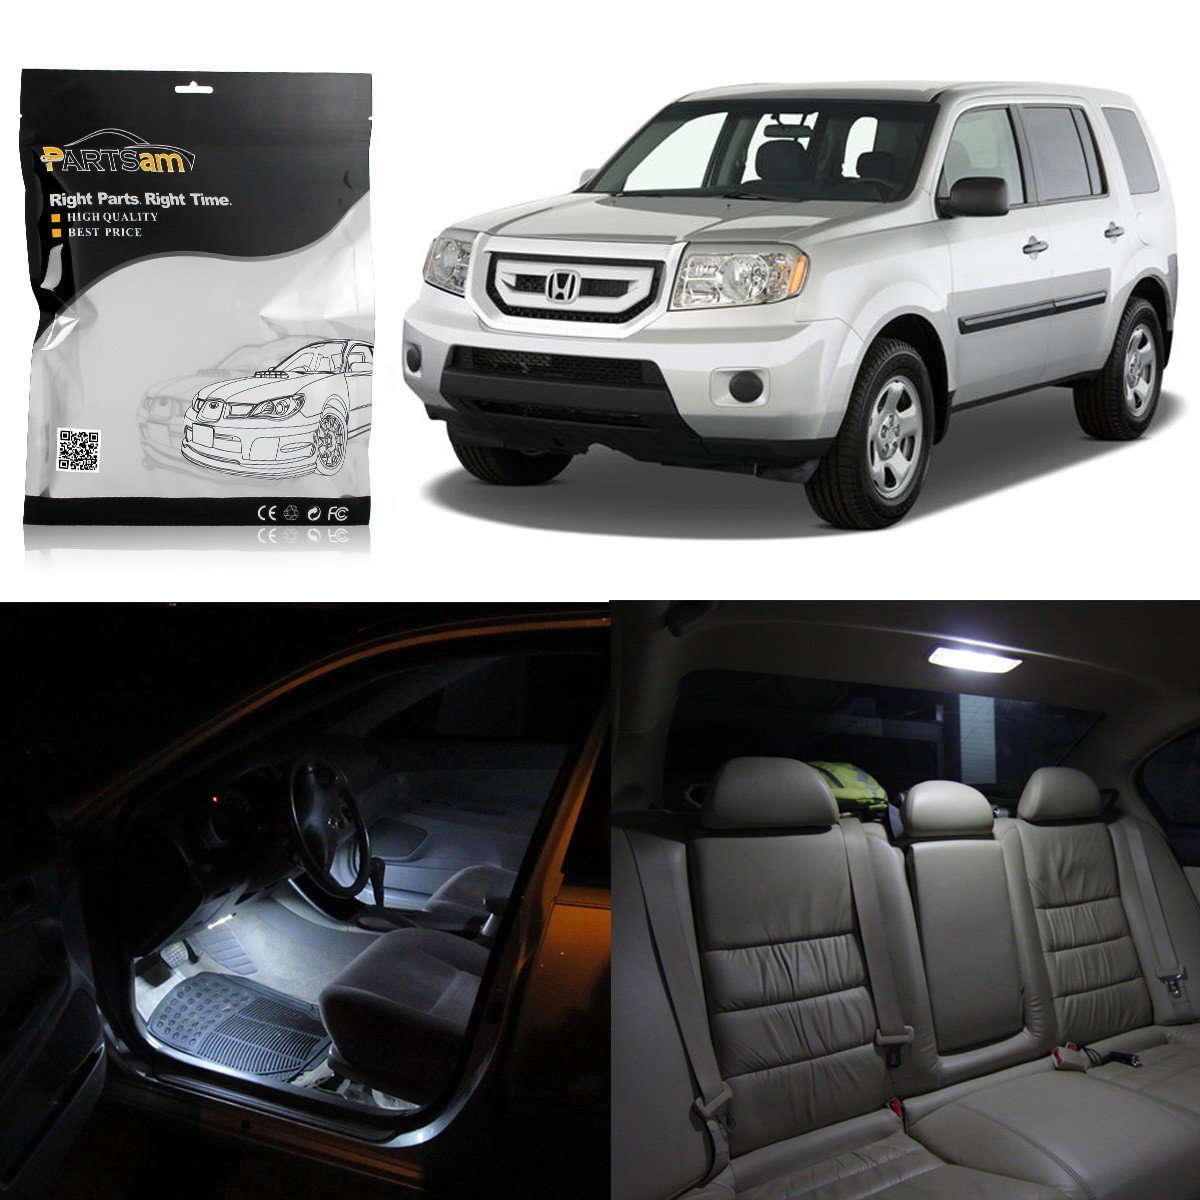 Partsam LED Interior Package Light Kits + License Plate Light Compatible  with Honda Pilot 2009 2010 2011 2012 2013 2014 2015-17Pcs/White